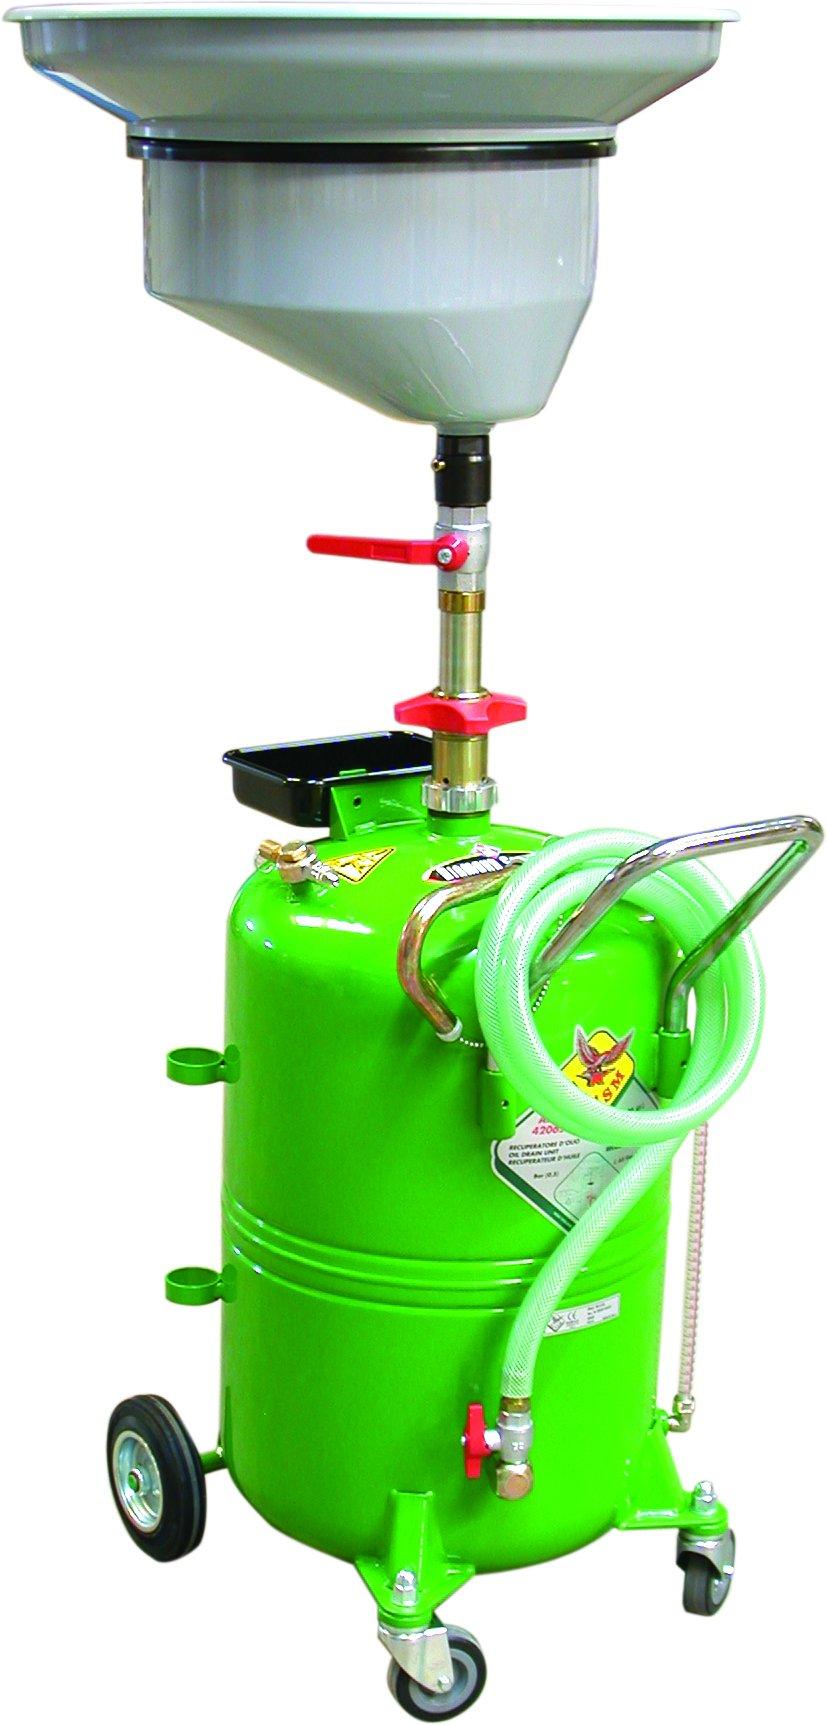 National-Spencer 1235 Waste Oil Drainer, 17 gal